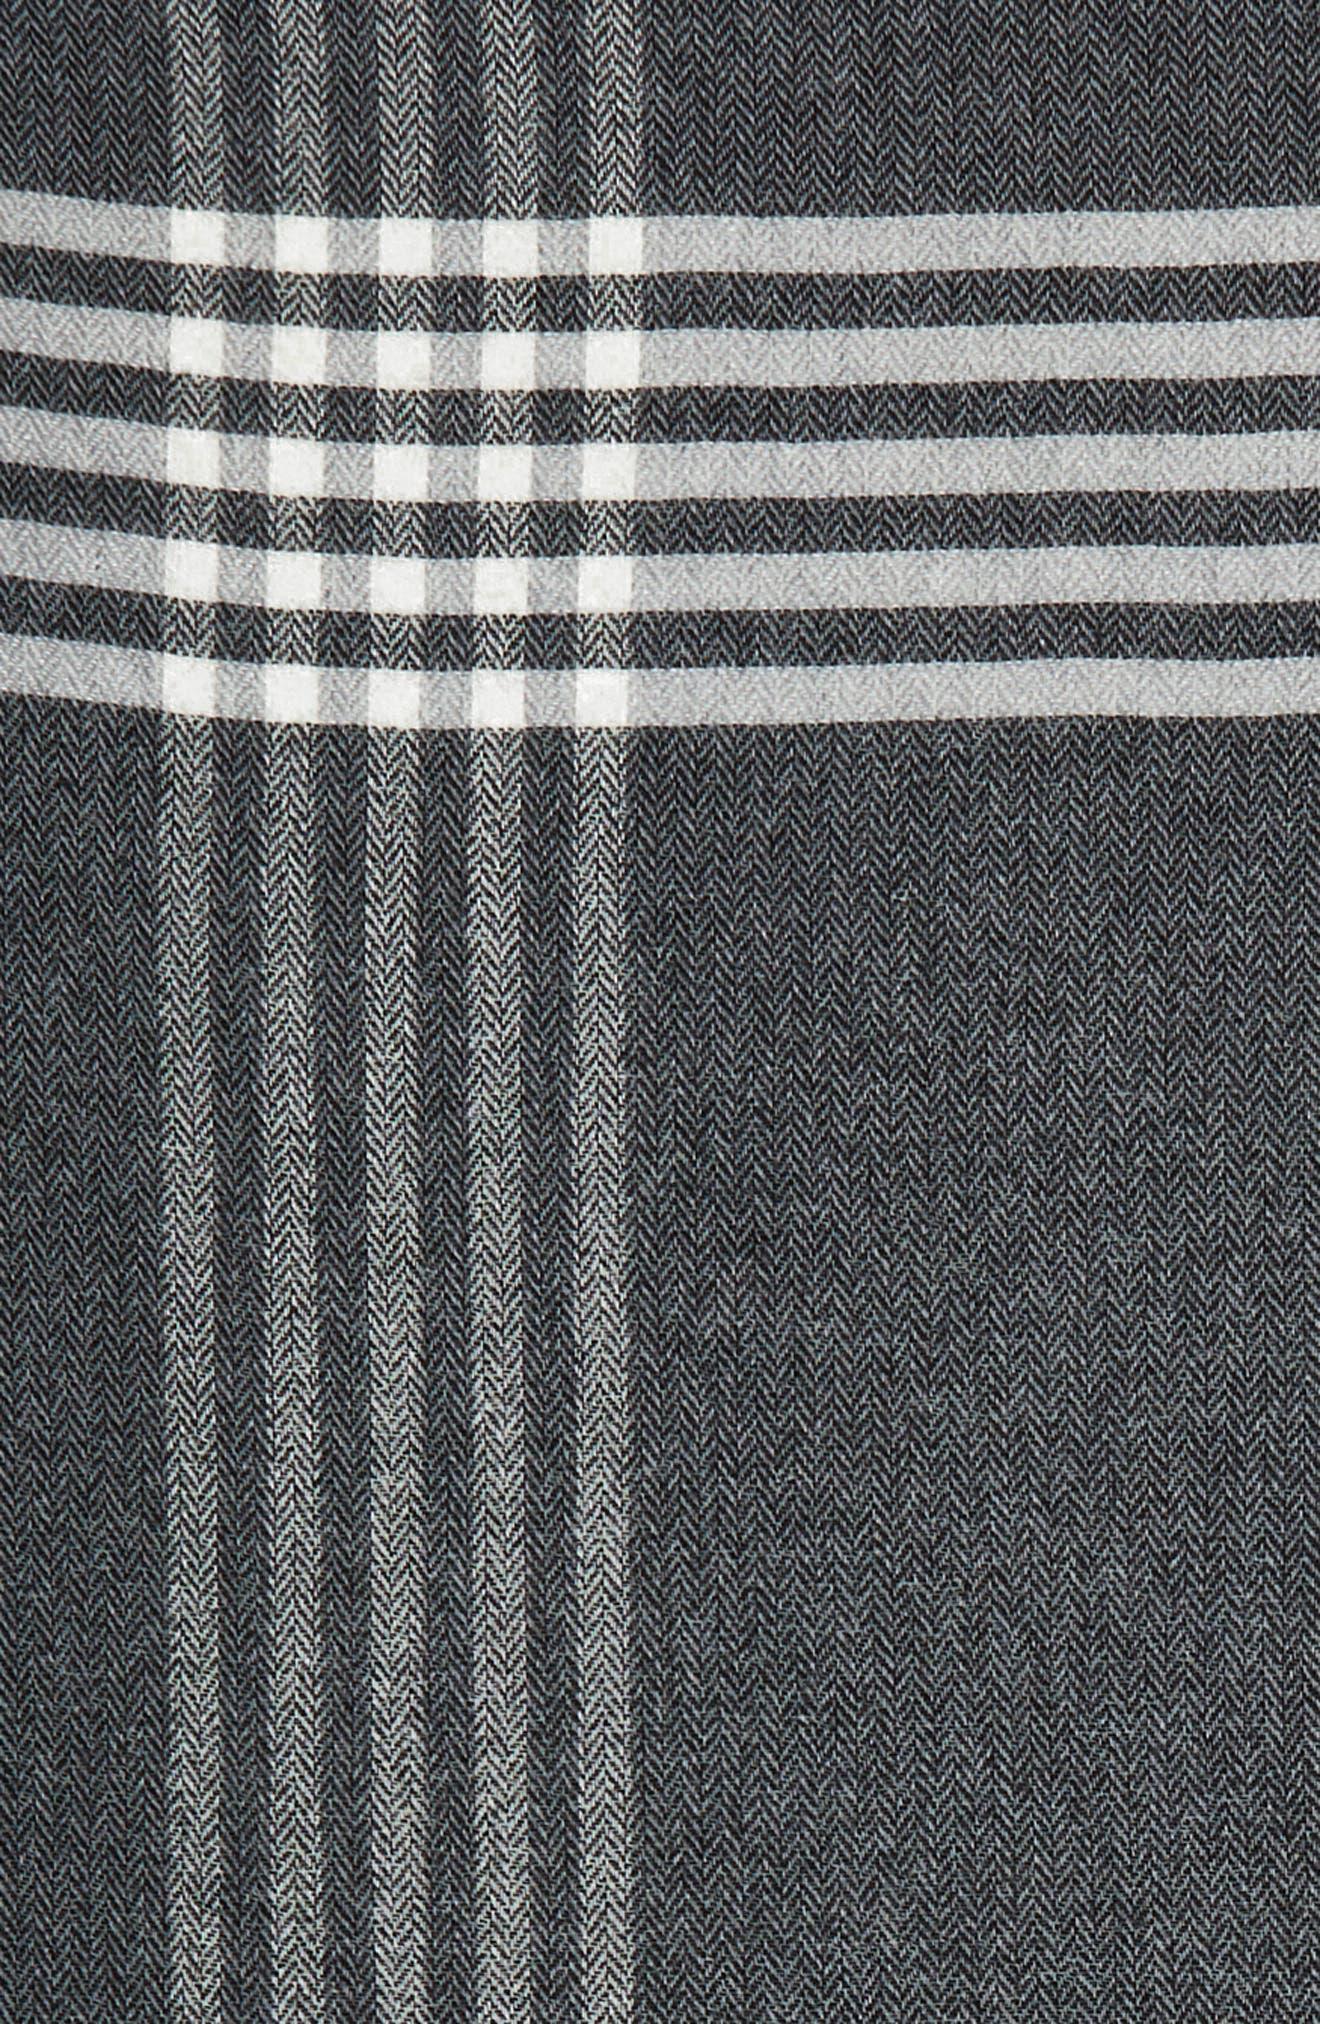 Plaid Wool Blend Scarf,                             Alternate thumbnail 4, color,                             021